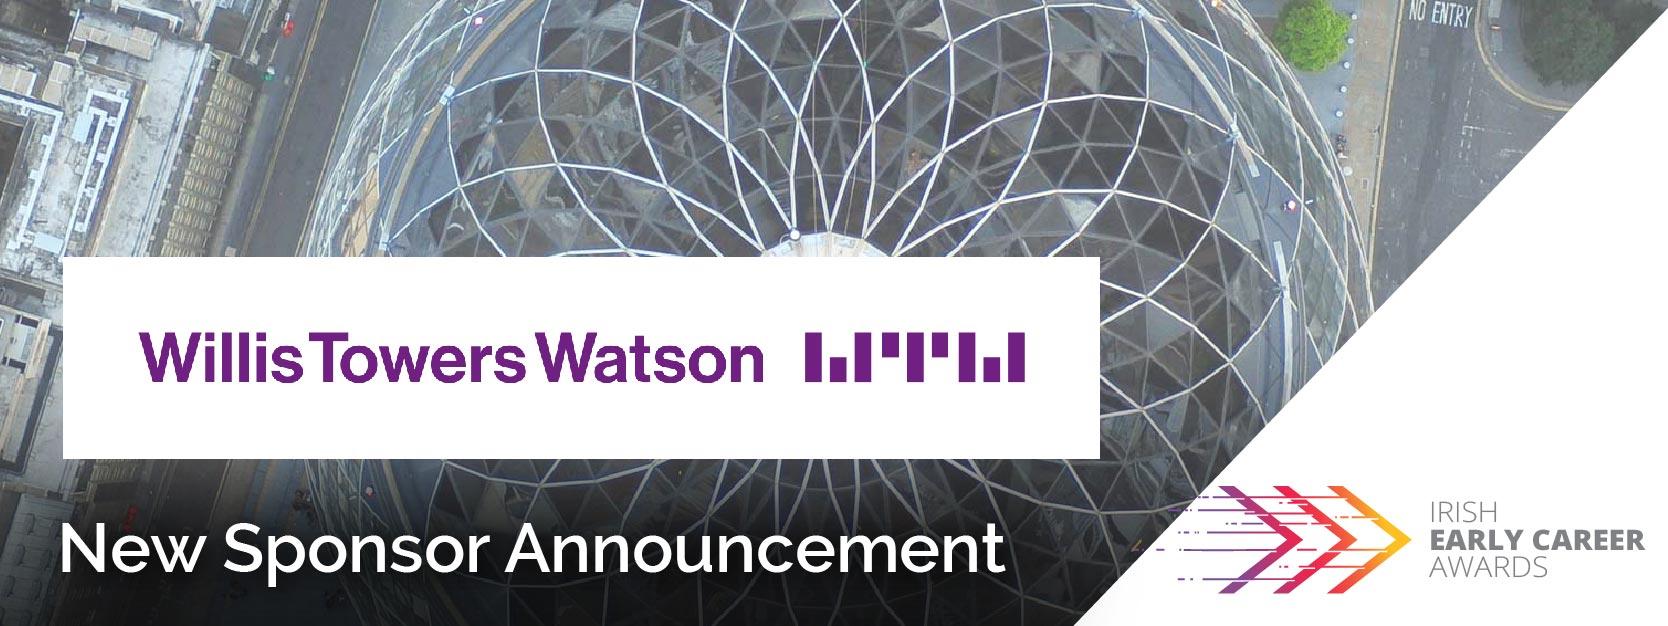 Willis Towers Watson sponsor Irish Early Career Awards